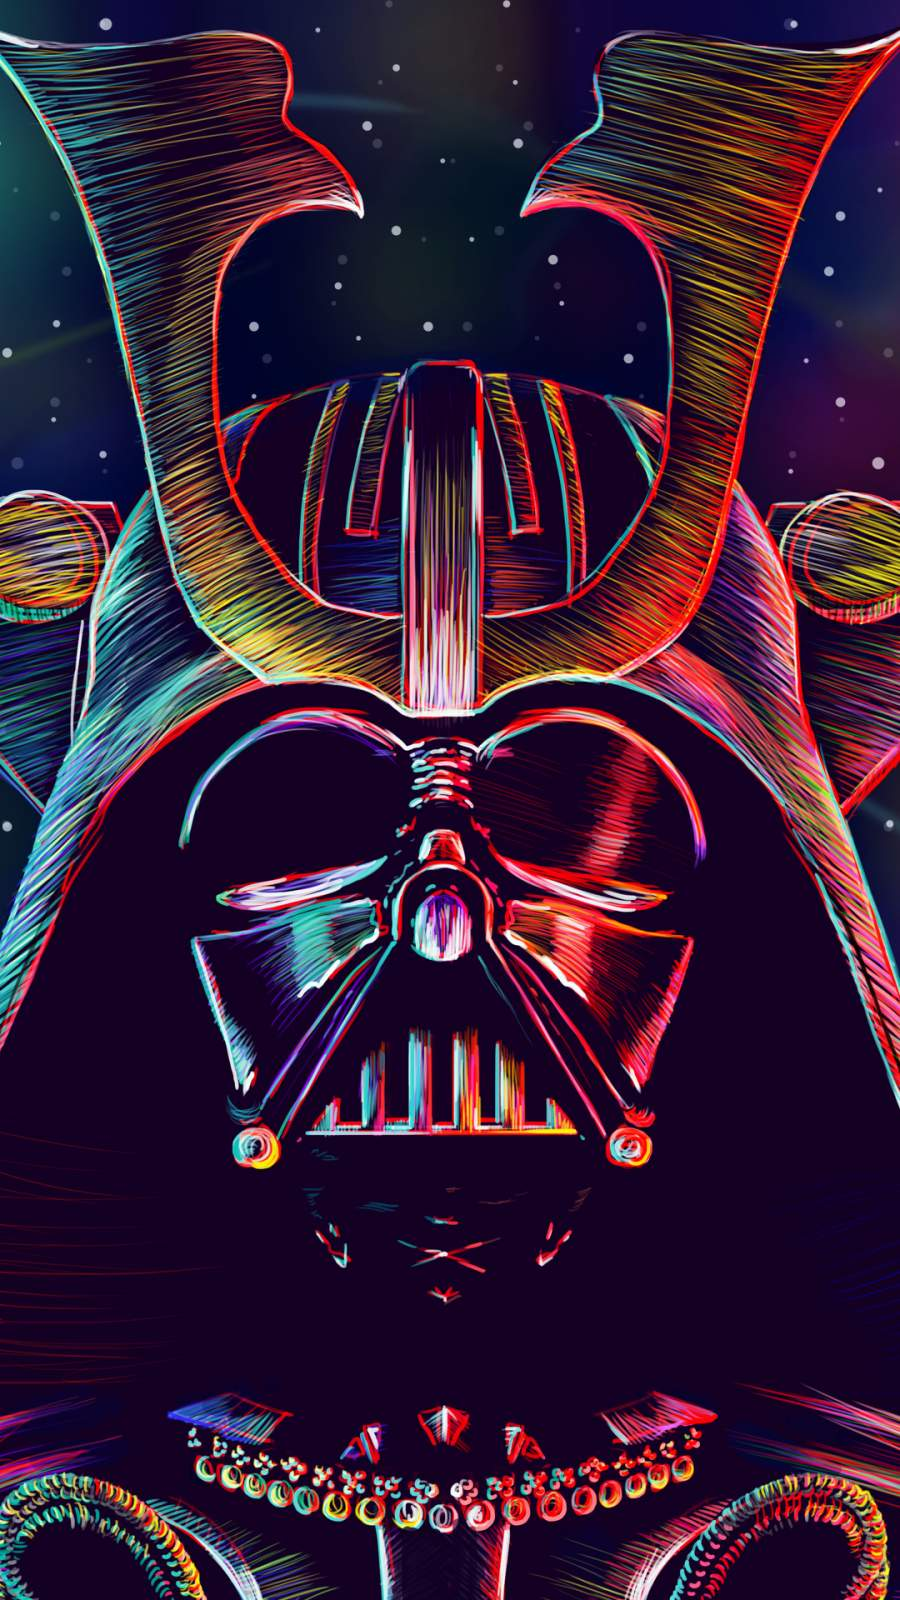 Darth Vader 4K iPhone Wallpaper